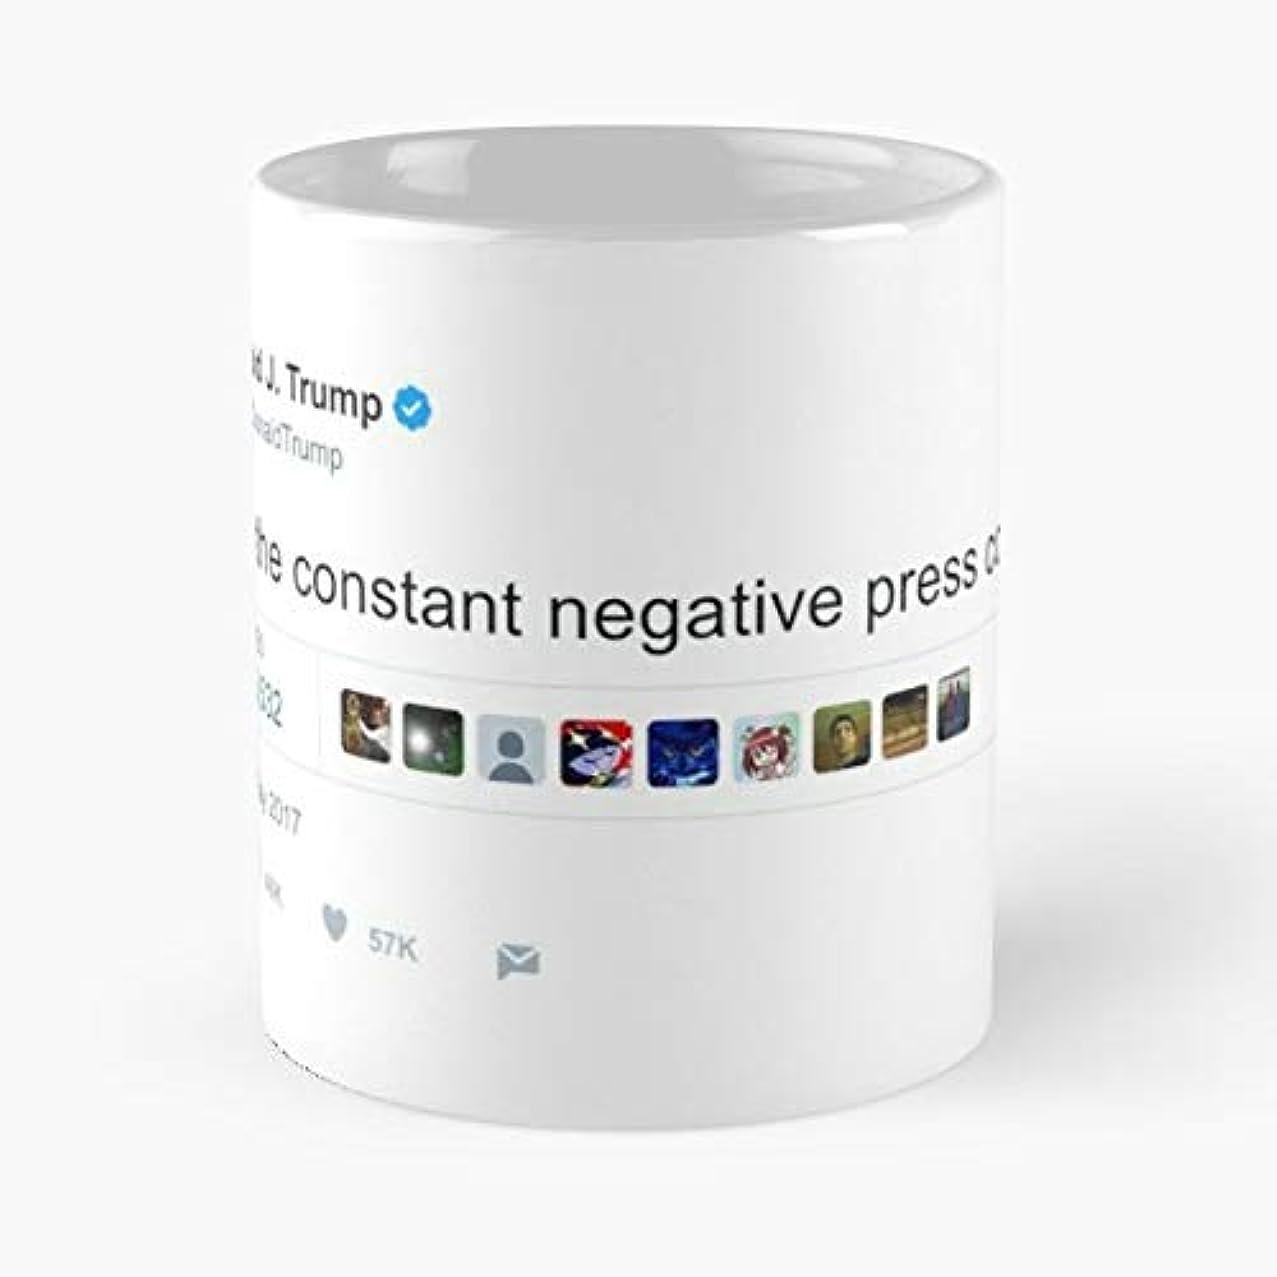 Donald Trump Usa President Coffee Mugs Unique Ceramic Novelty Cup